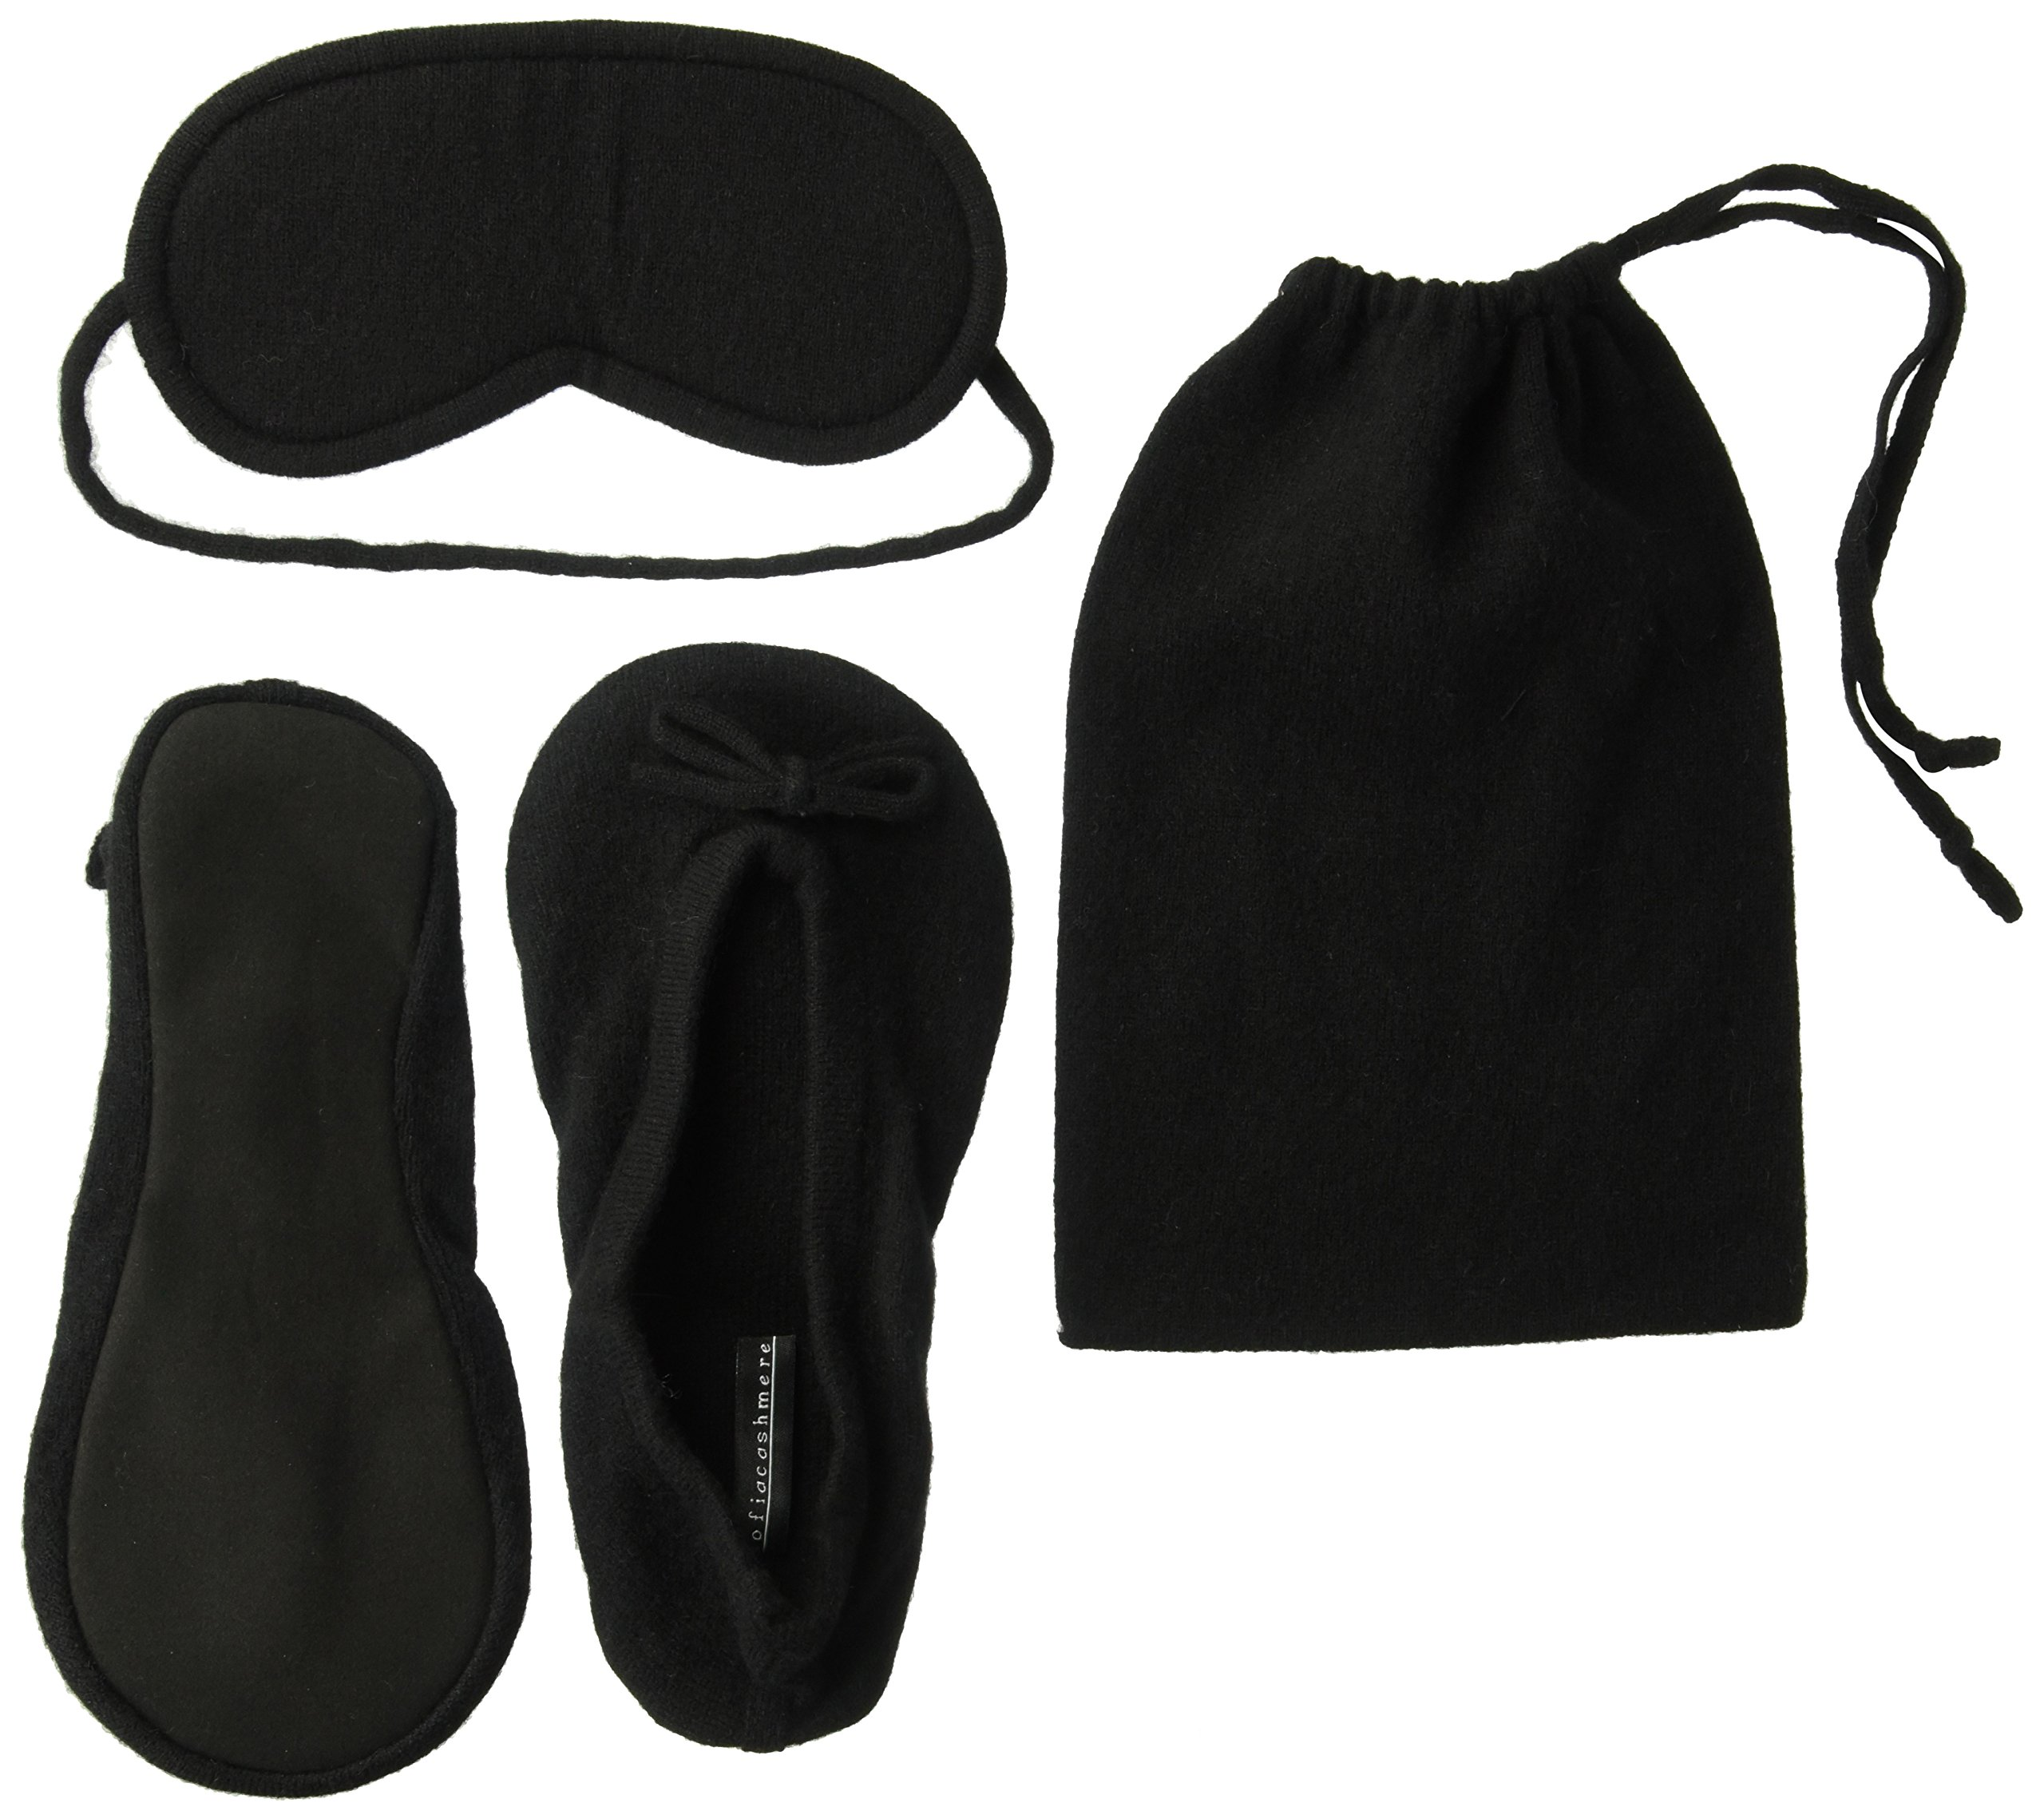 Sofia Cashmere Women's Cashmere Travel Set with Drawstring Pouch, black, S/M